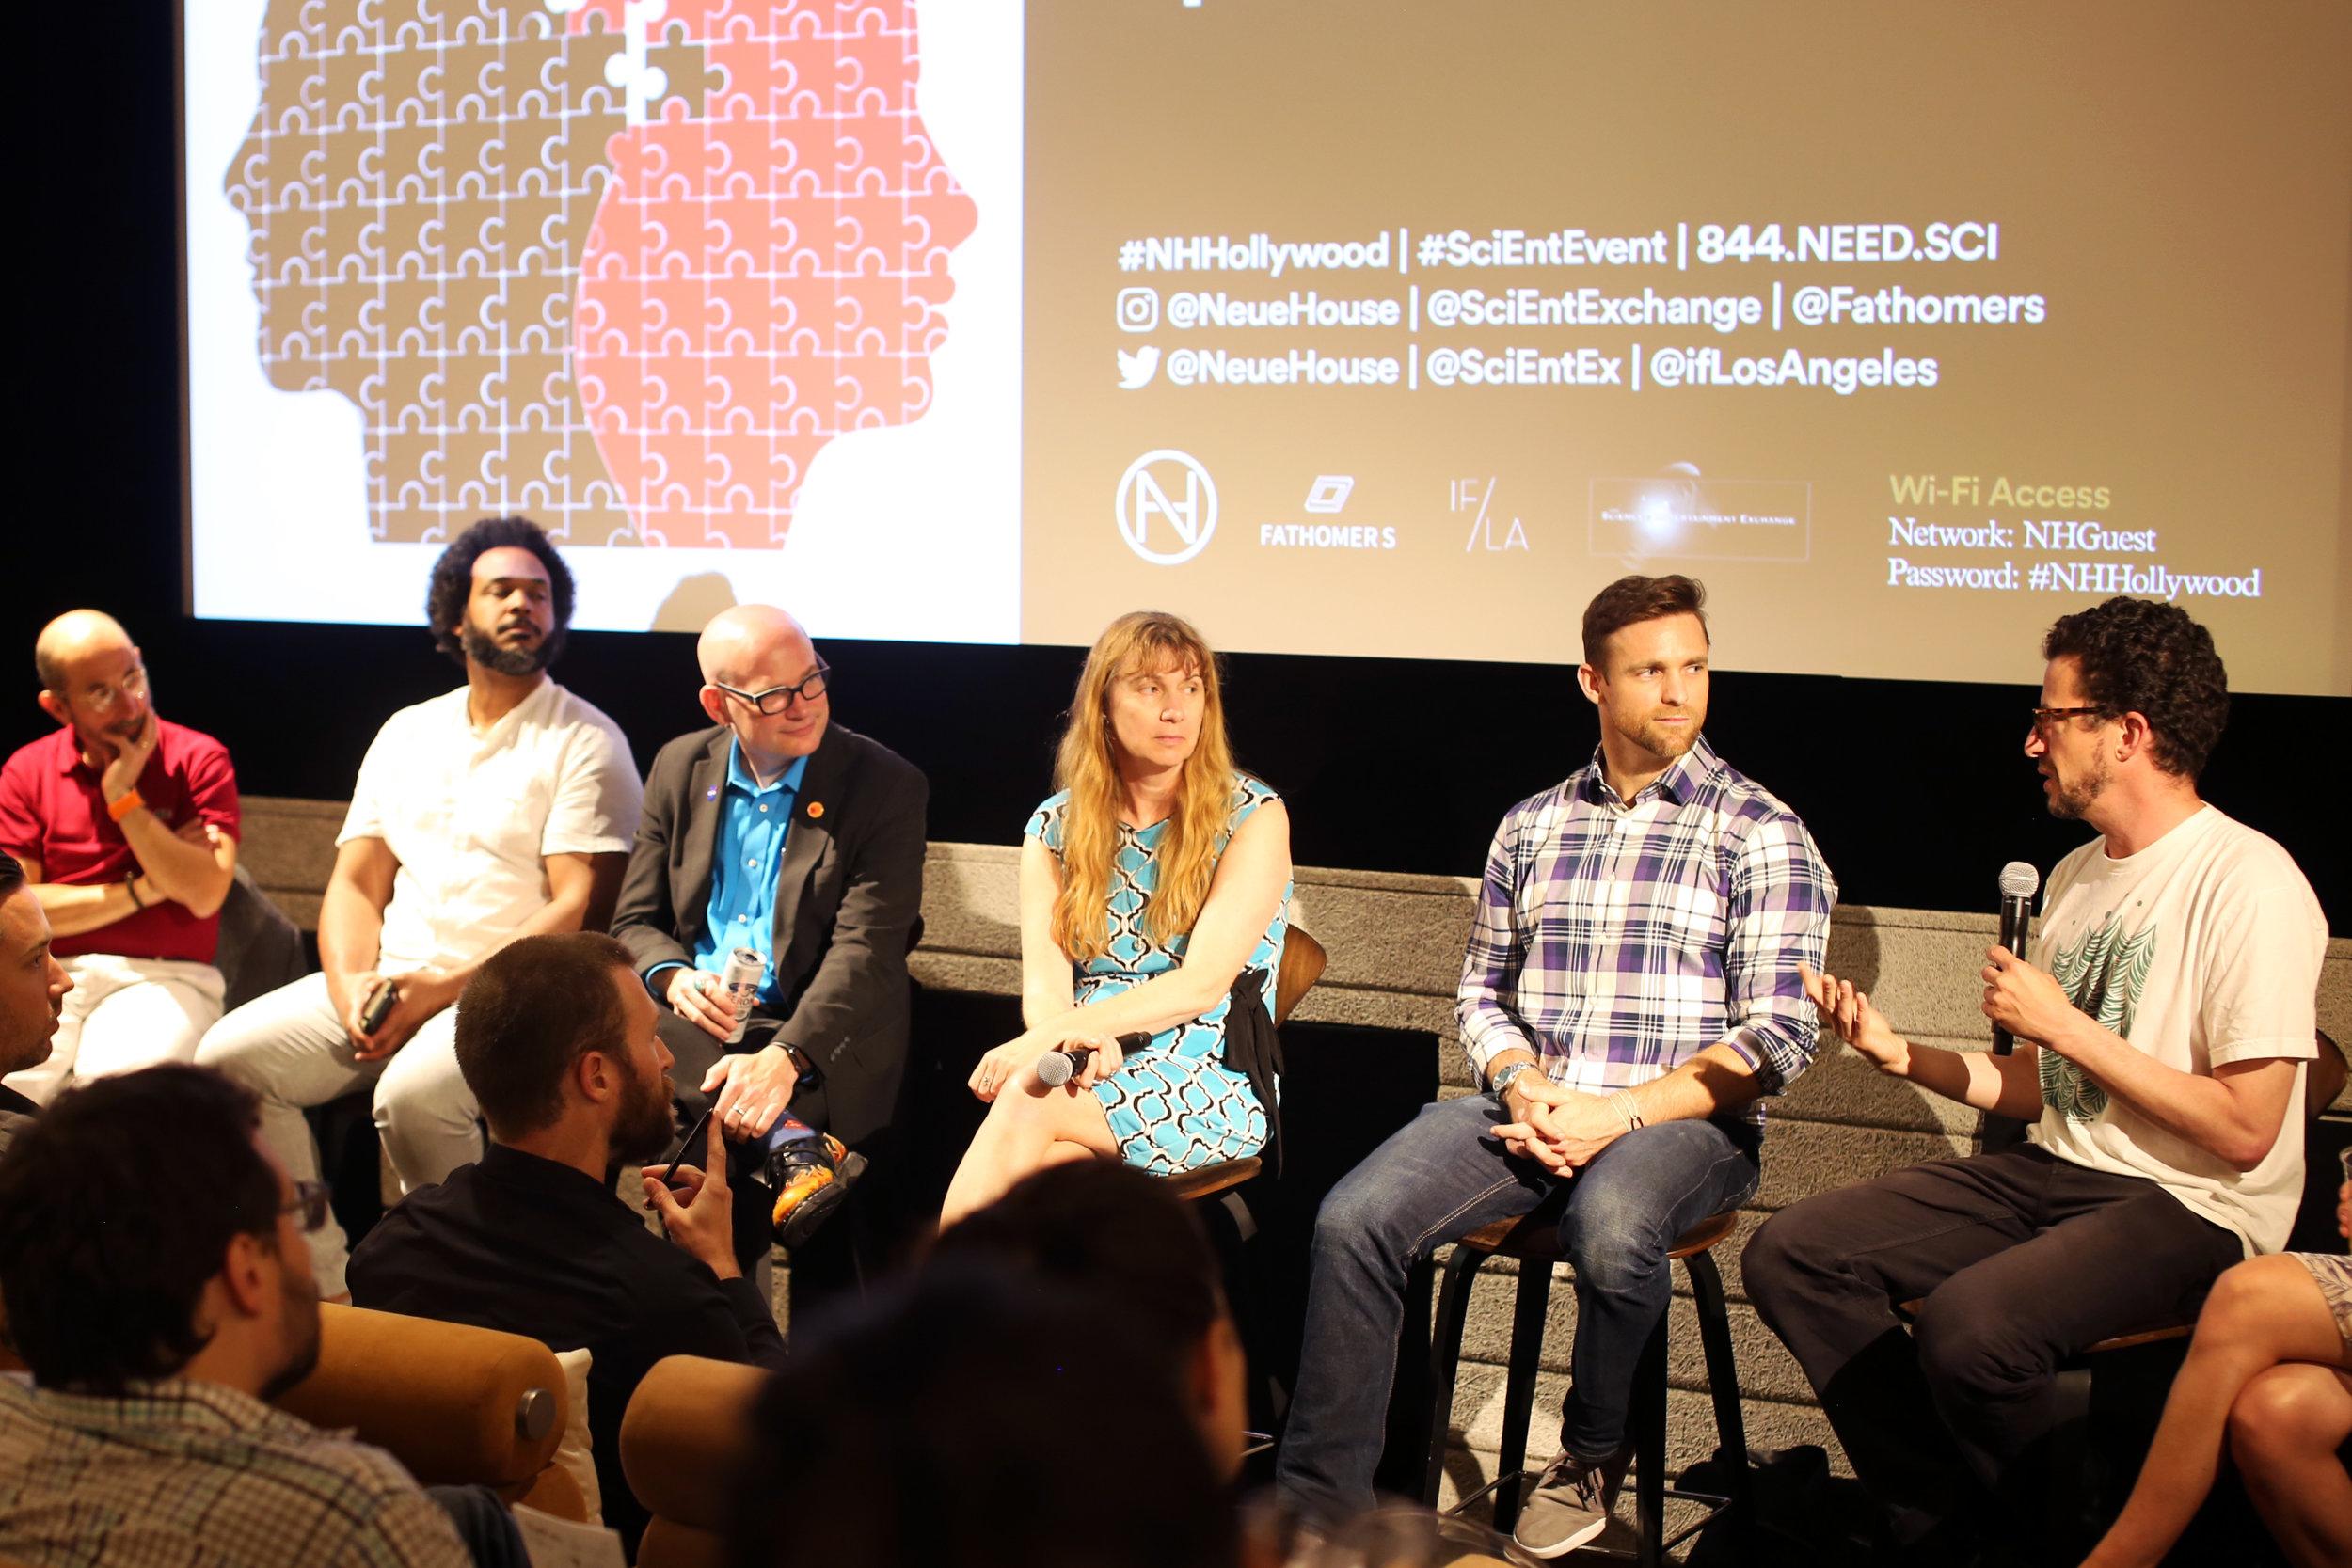 Science Speed Dating presenters (left to right): Joaquín Madrenas, Tahir Hemphill, C. Alex Young, Maja Matarić, Zach McKinney, and Phil Ross;at NeueHouse Hollywood. (photo:James Kennon Smith)